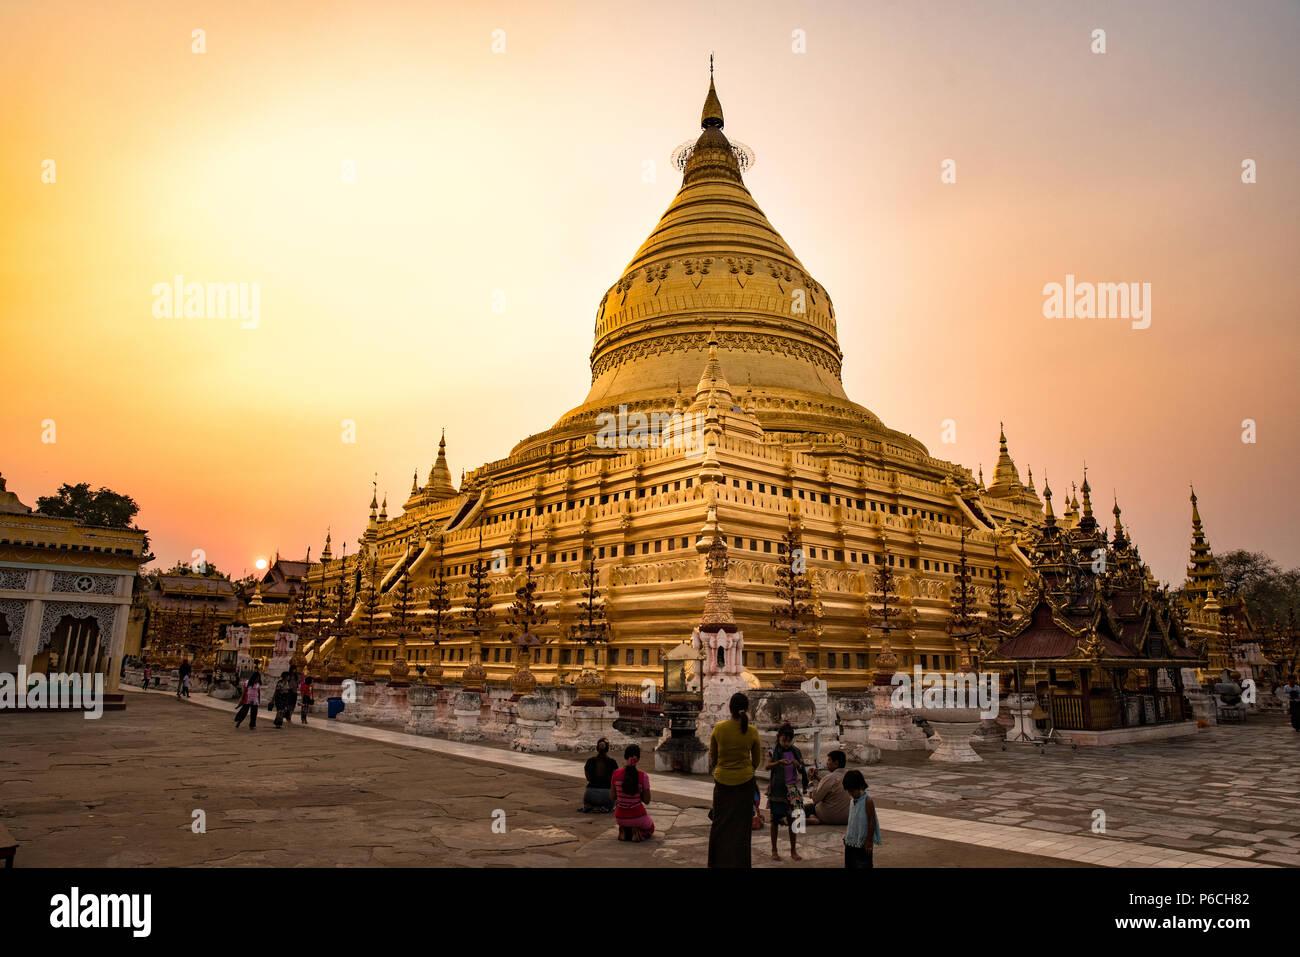 Golden Shwezigon pagoda in Bagan, Myanmar Stock Photo